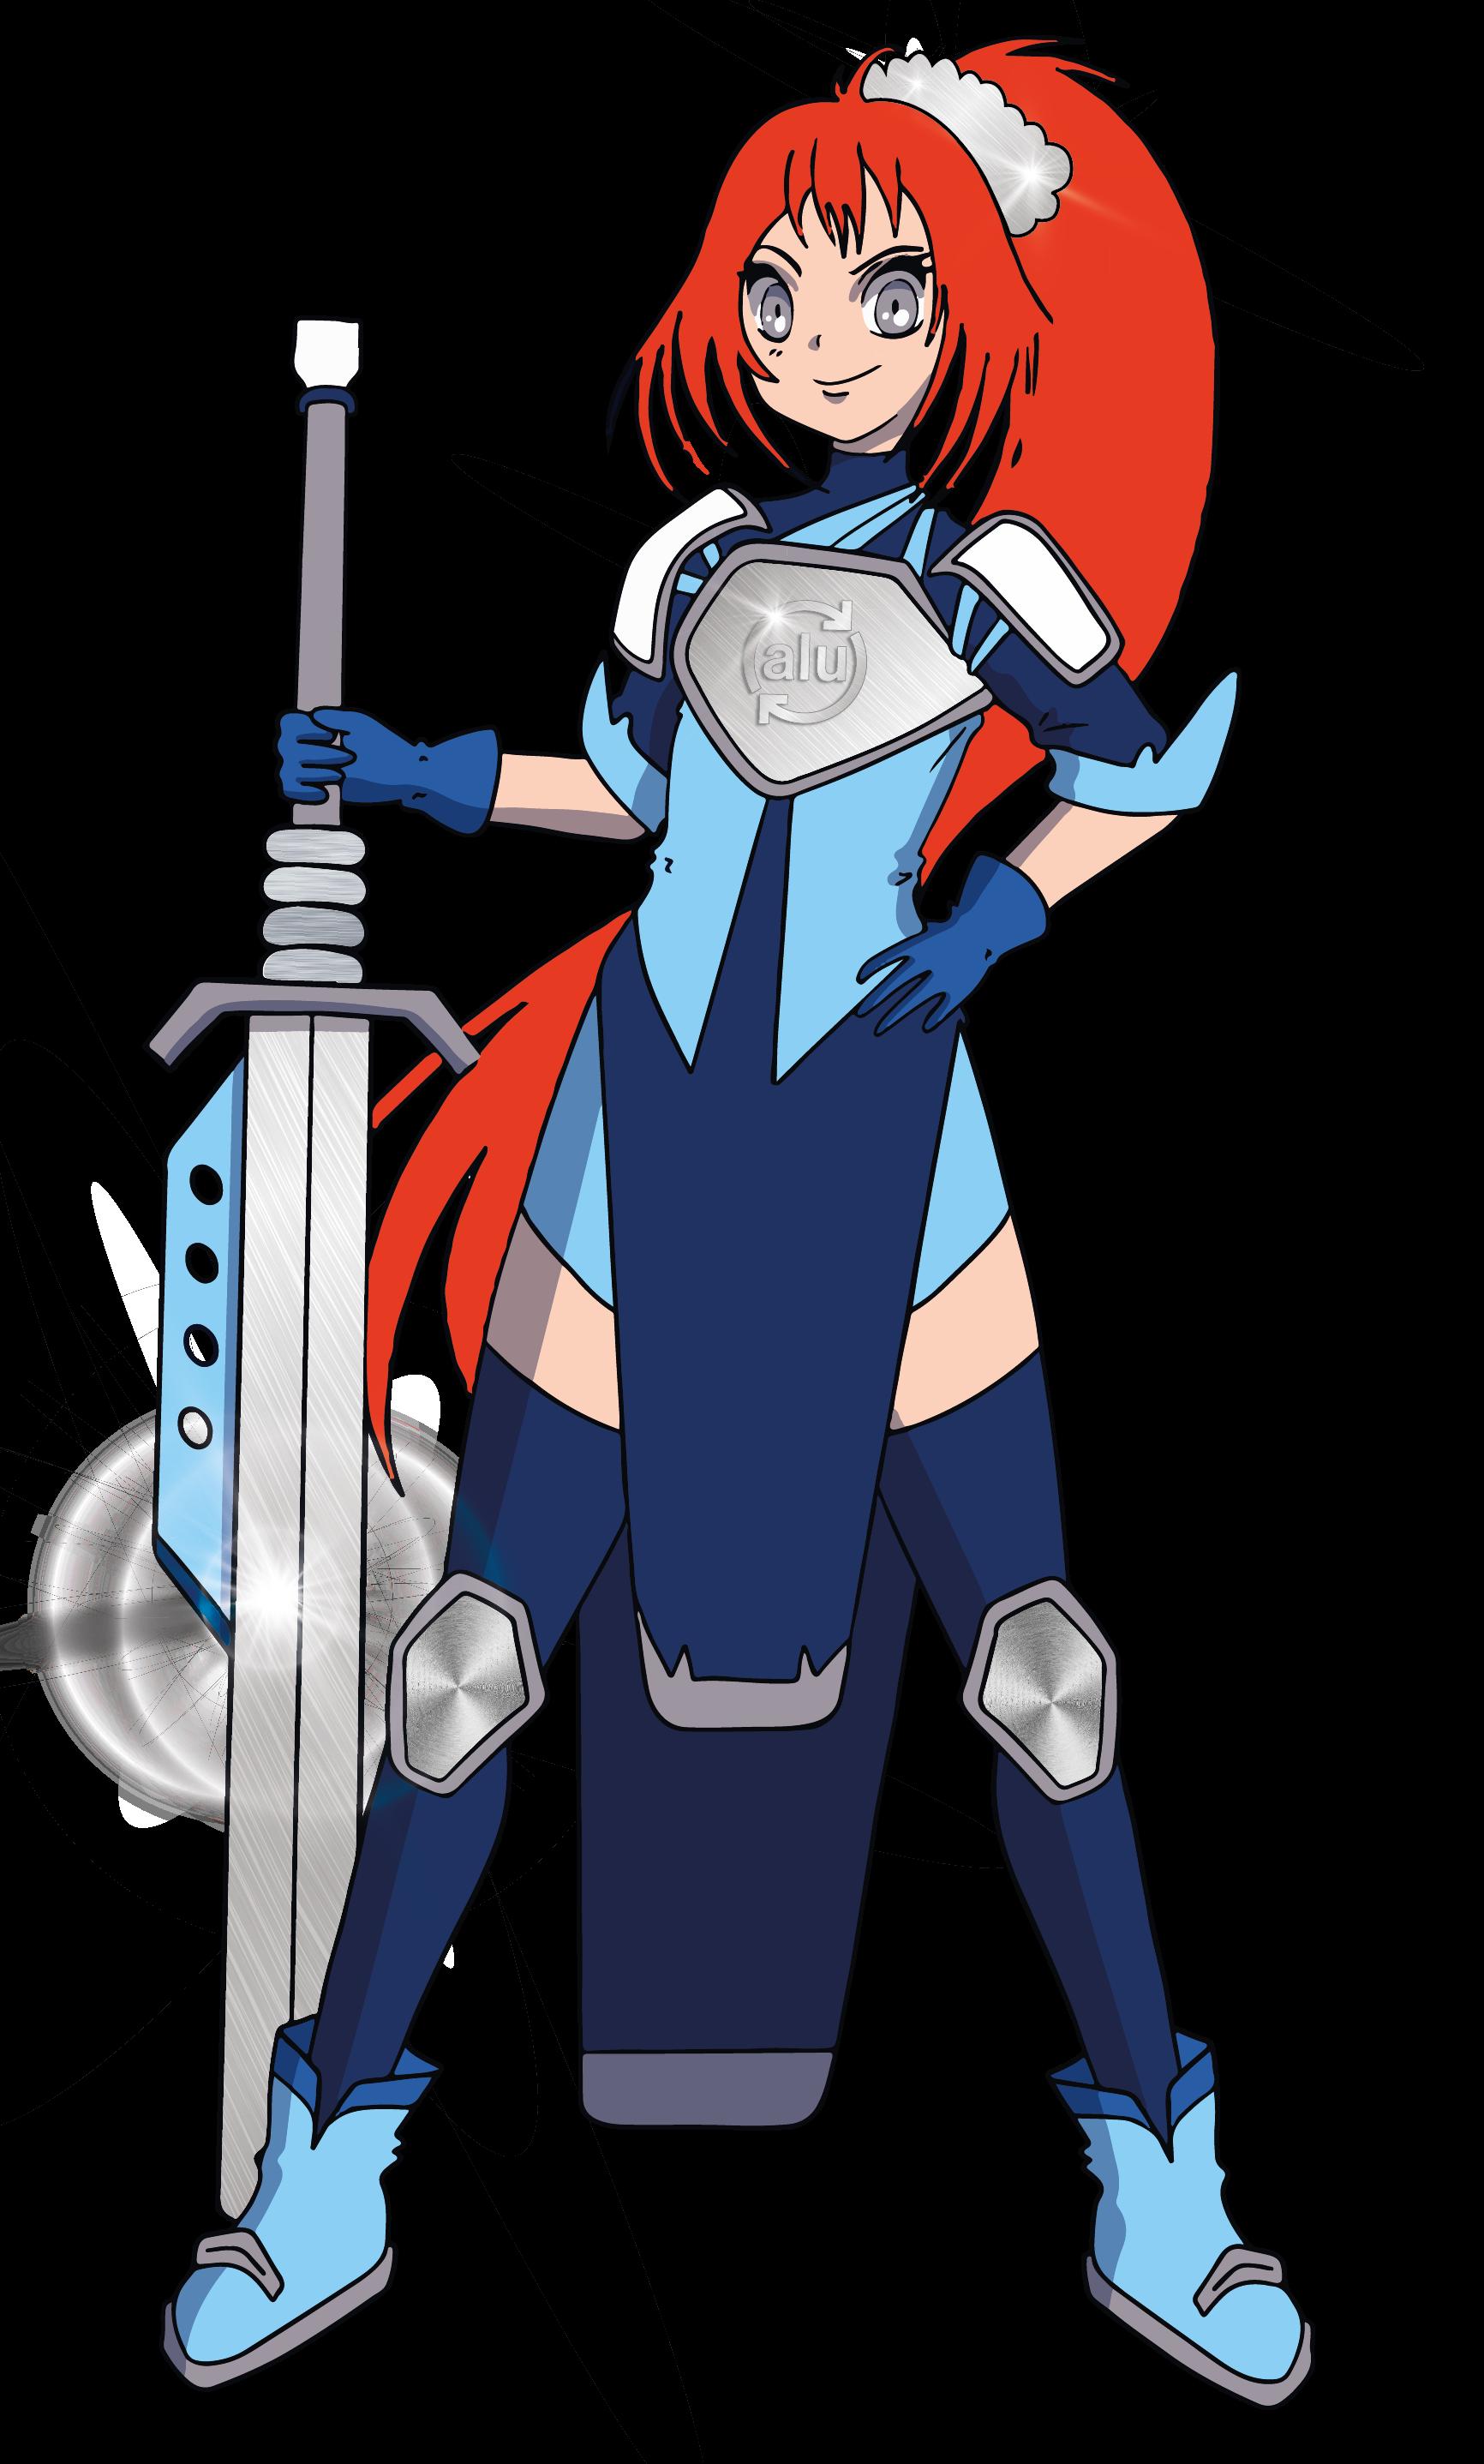 Female superhero - Ally